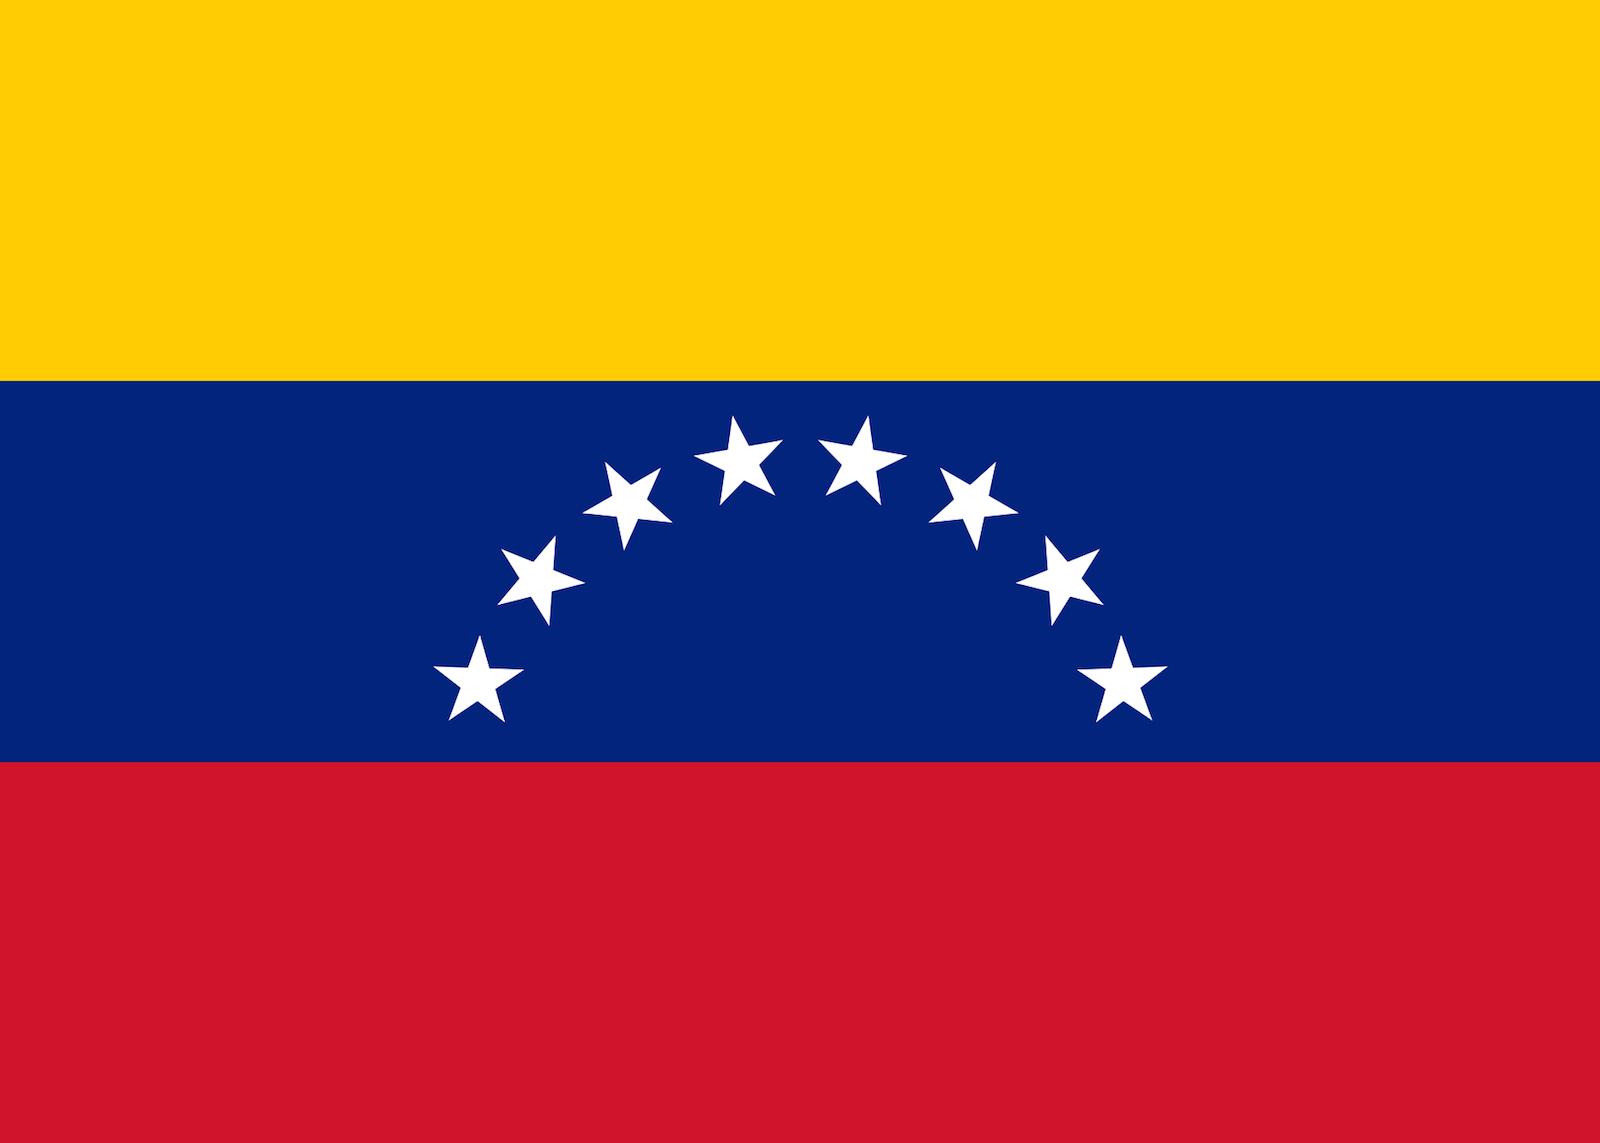 Open Letter in Support of Mediation in Venezuela, Not Sanctions